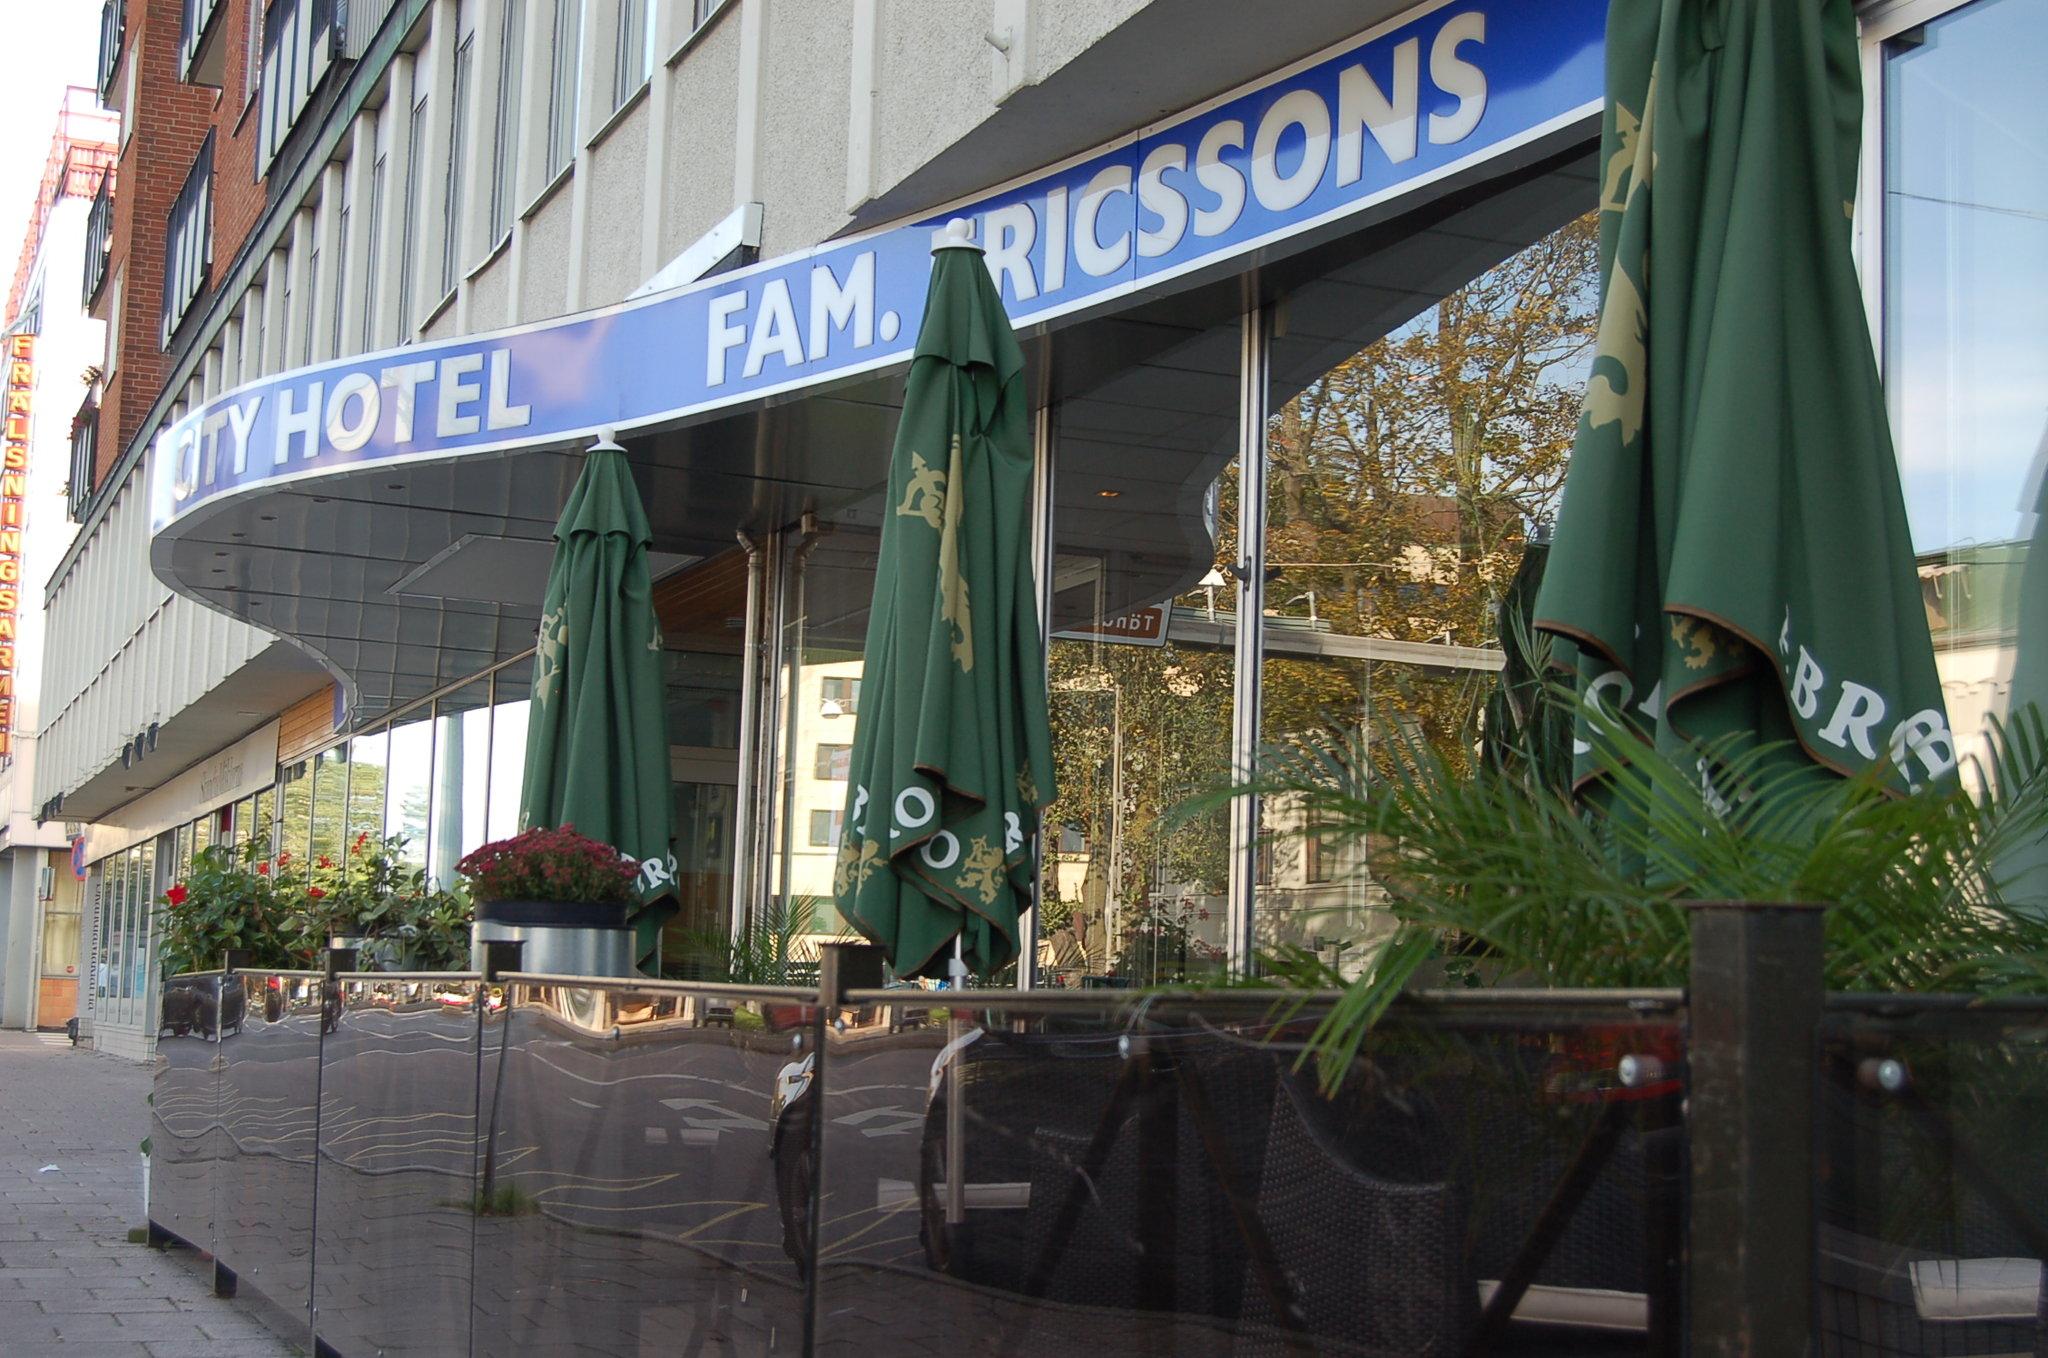 City Hotel Familjen Ericsson's